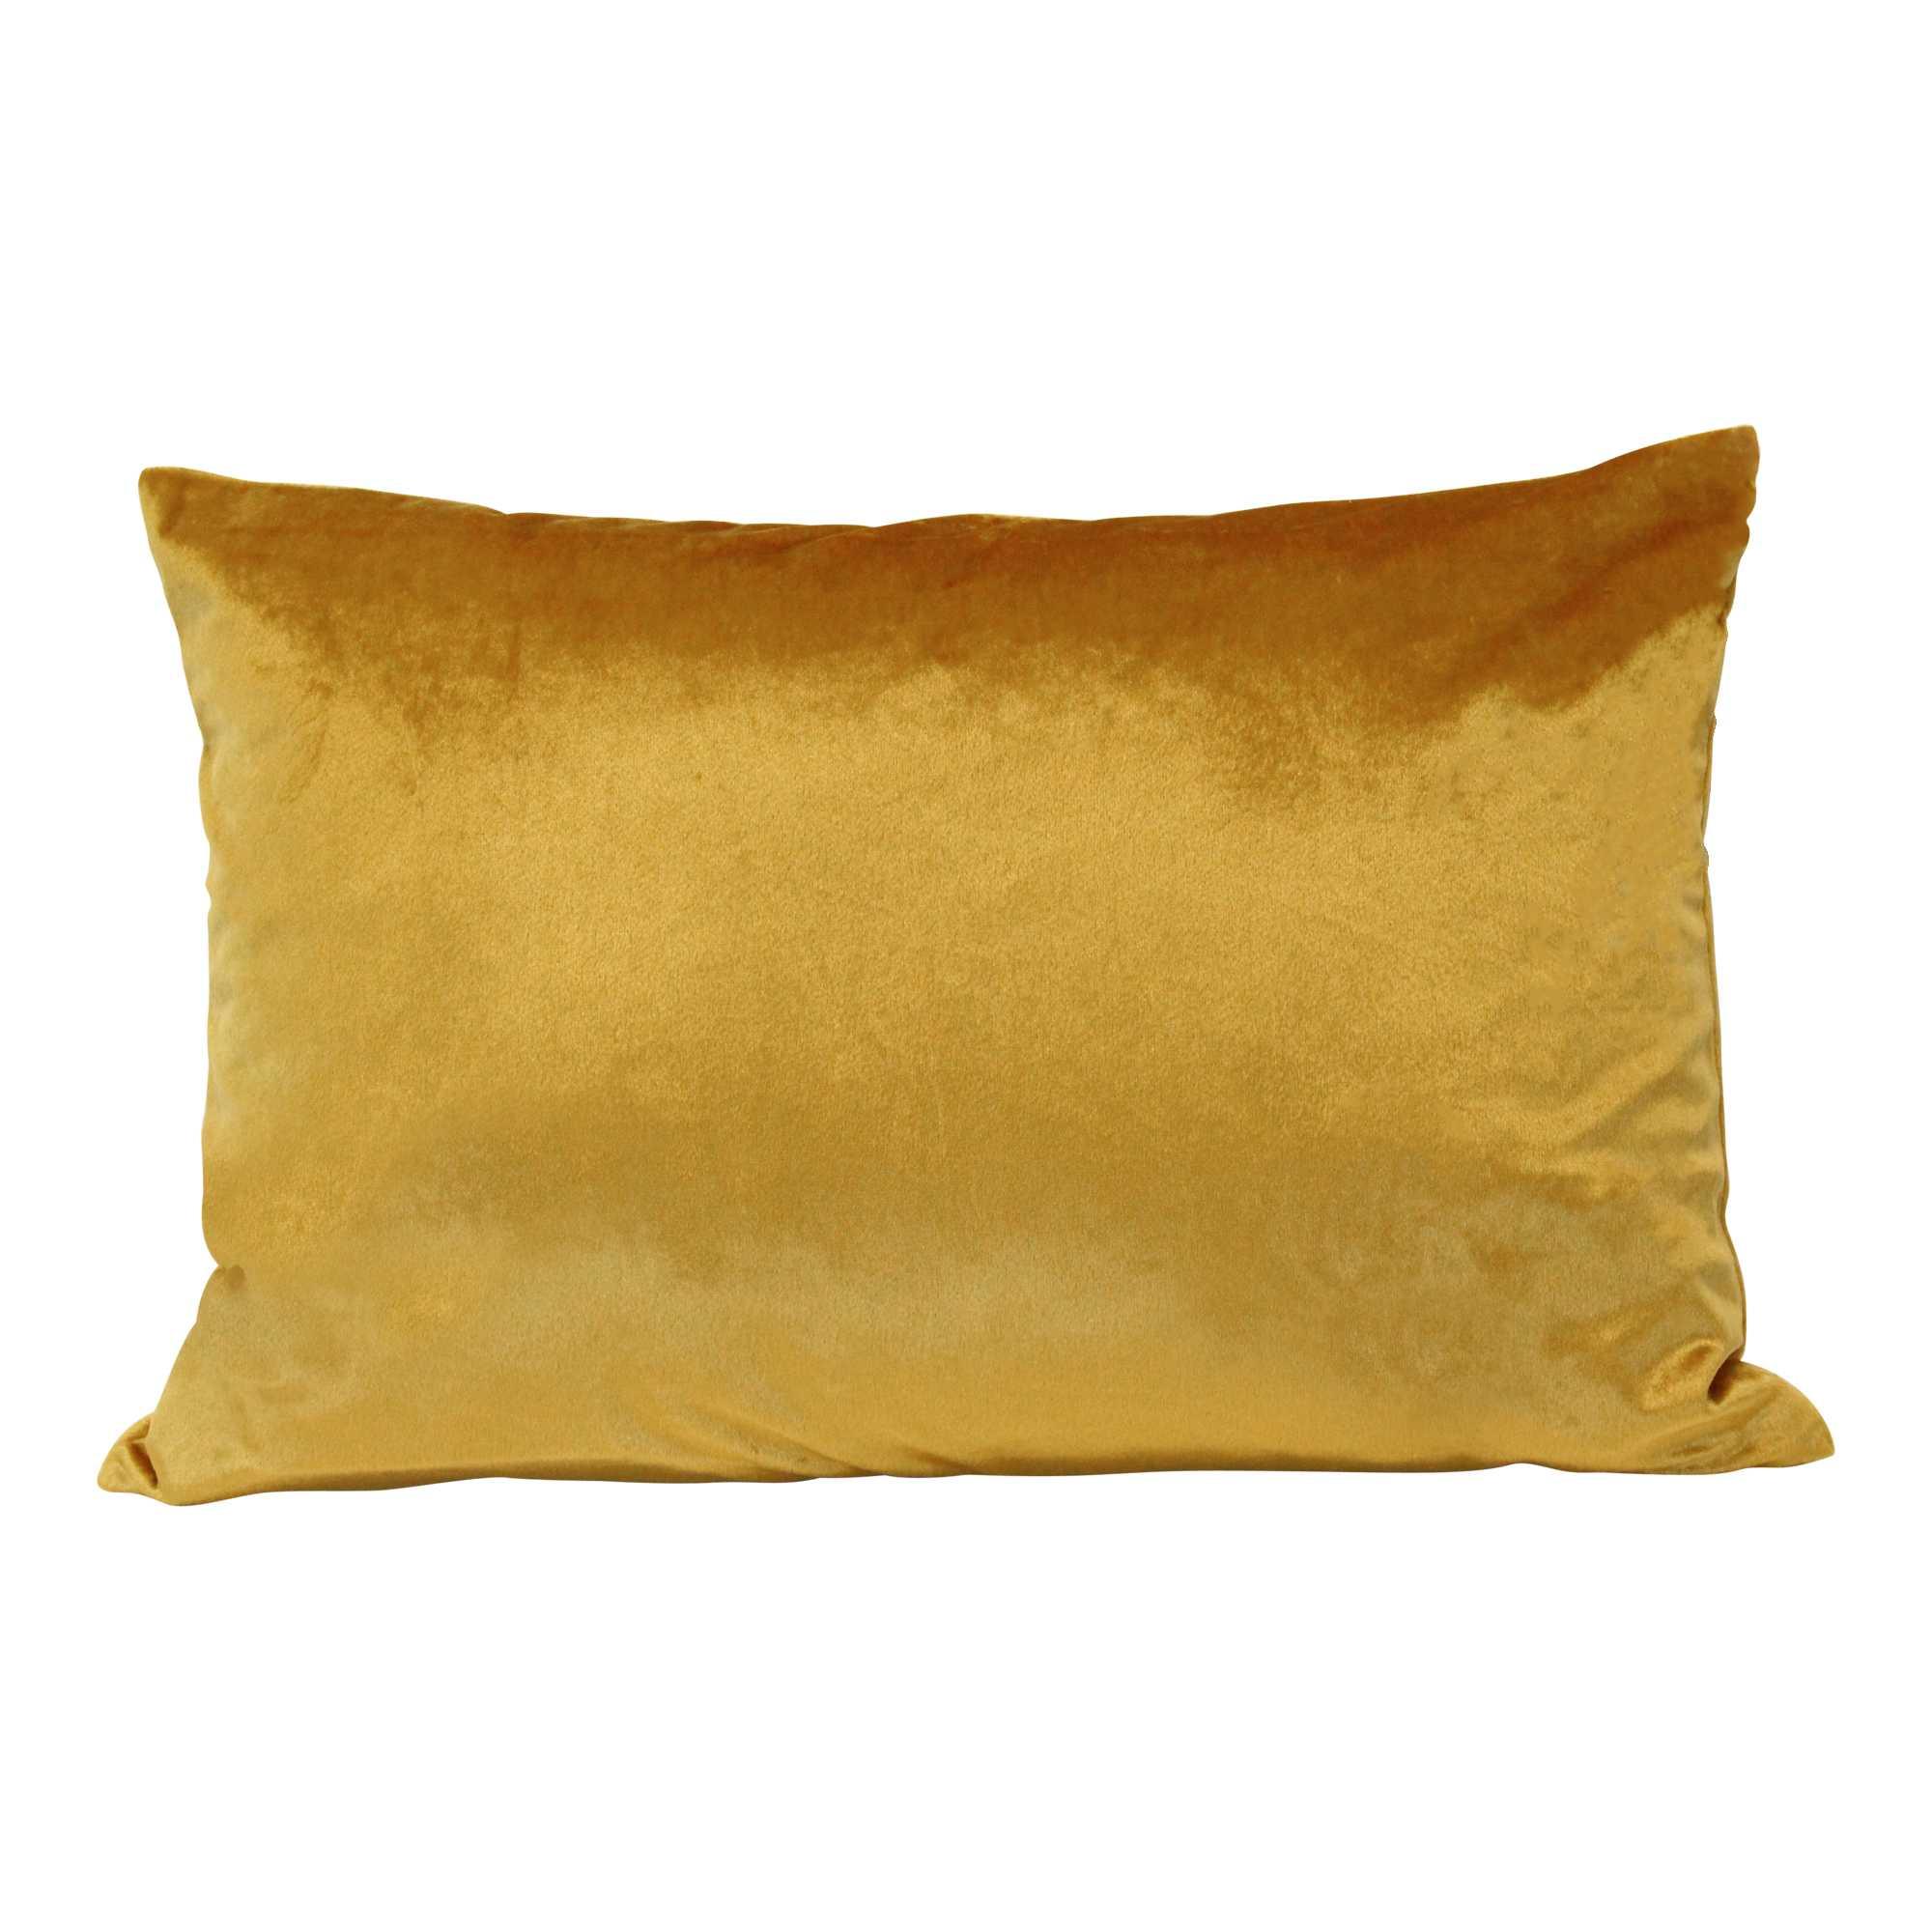 Gold Velvet Rectangular Lumbar Pillow